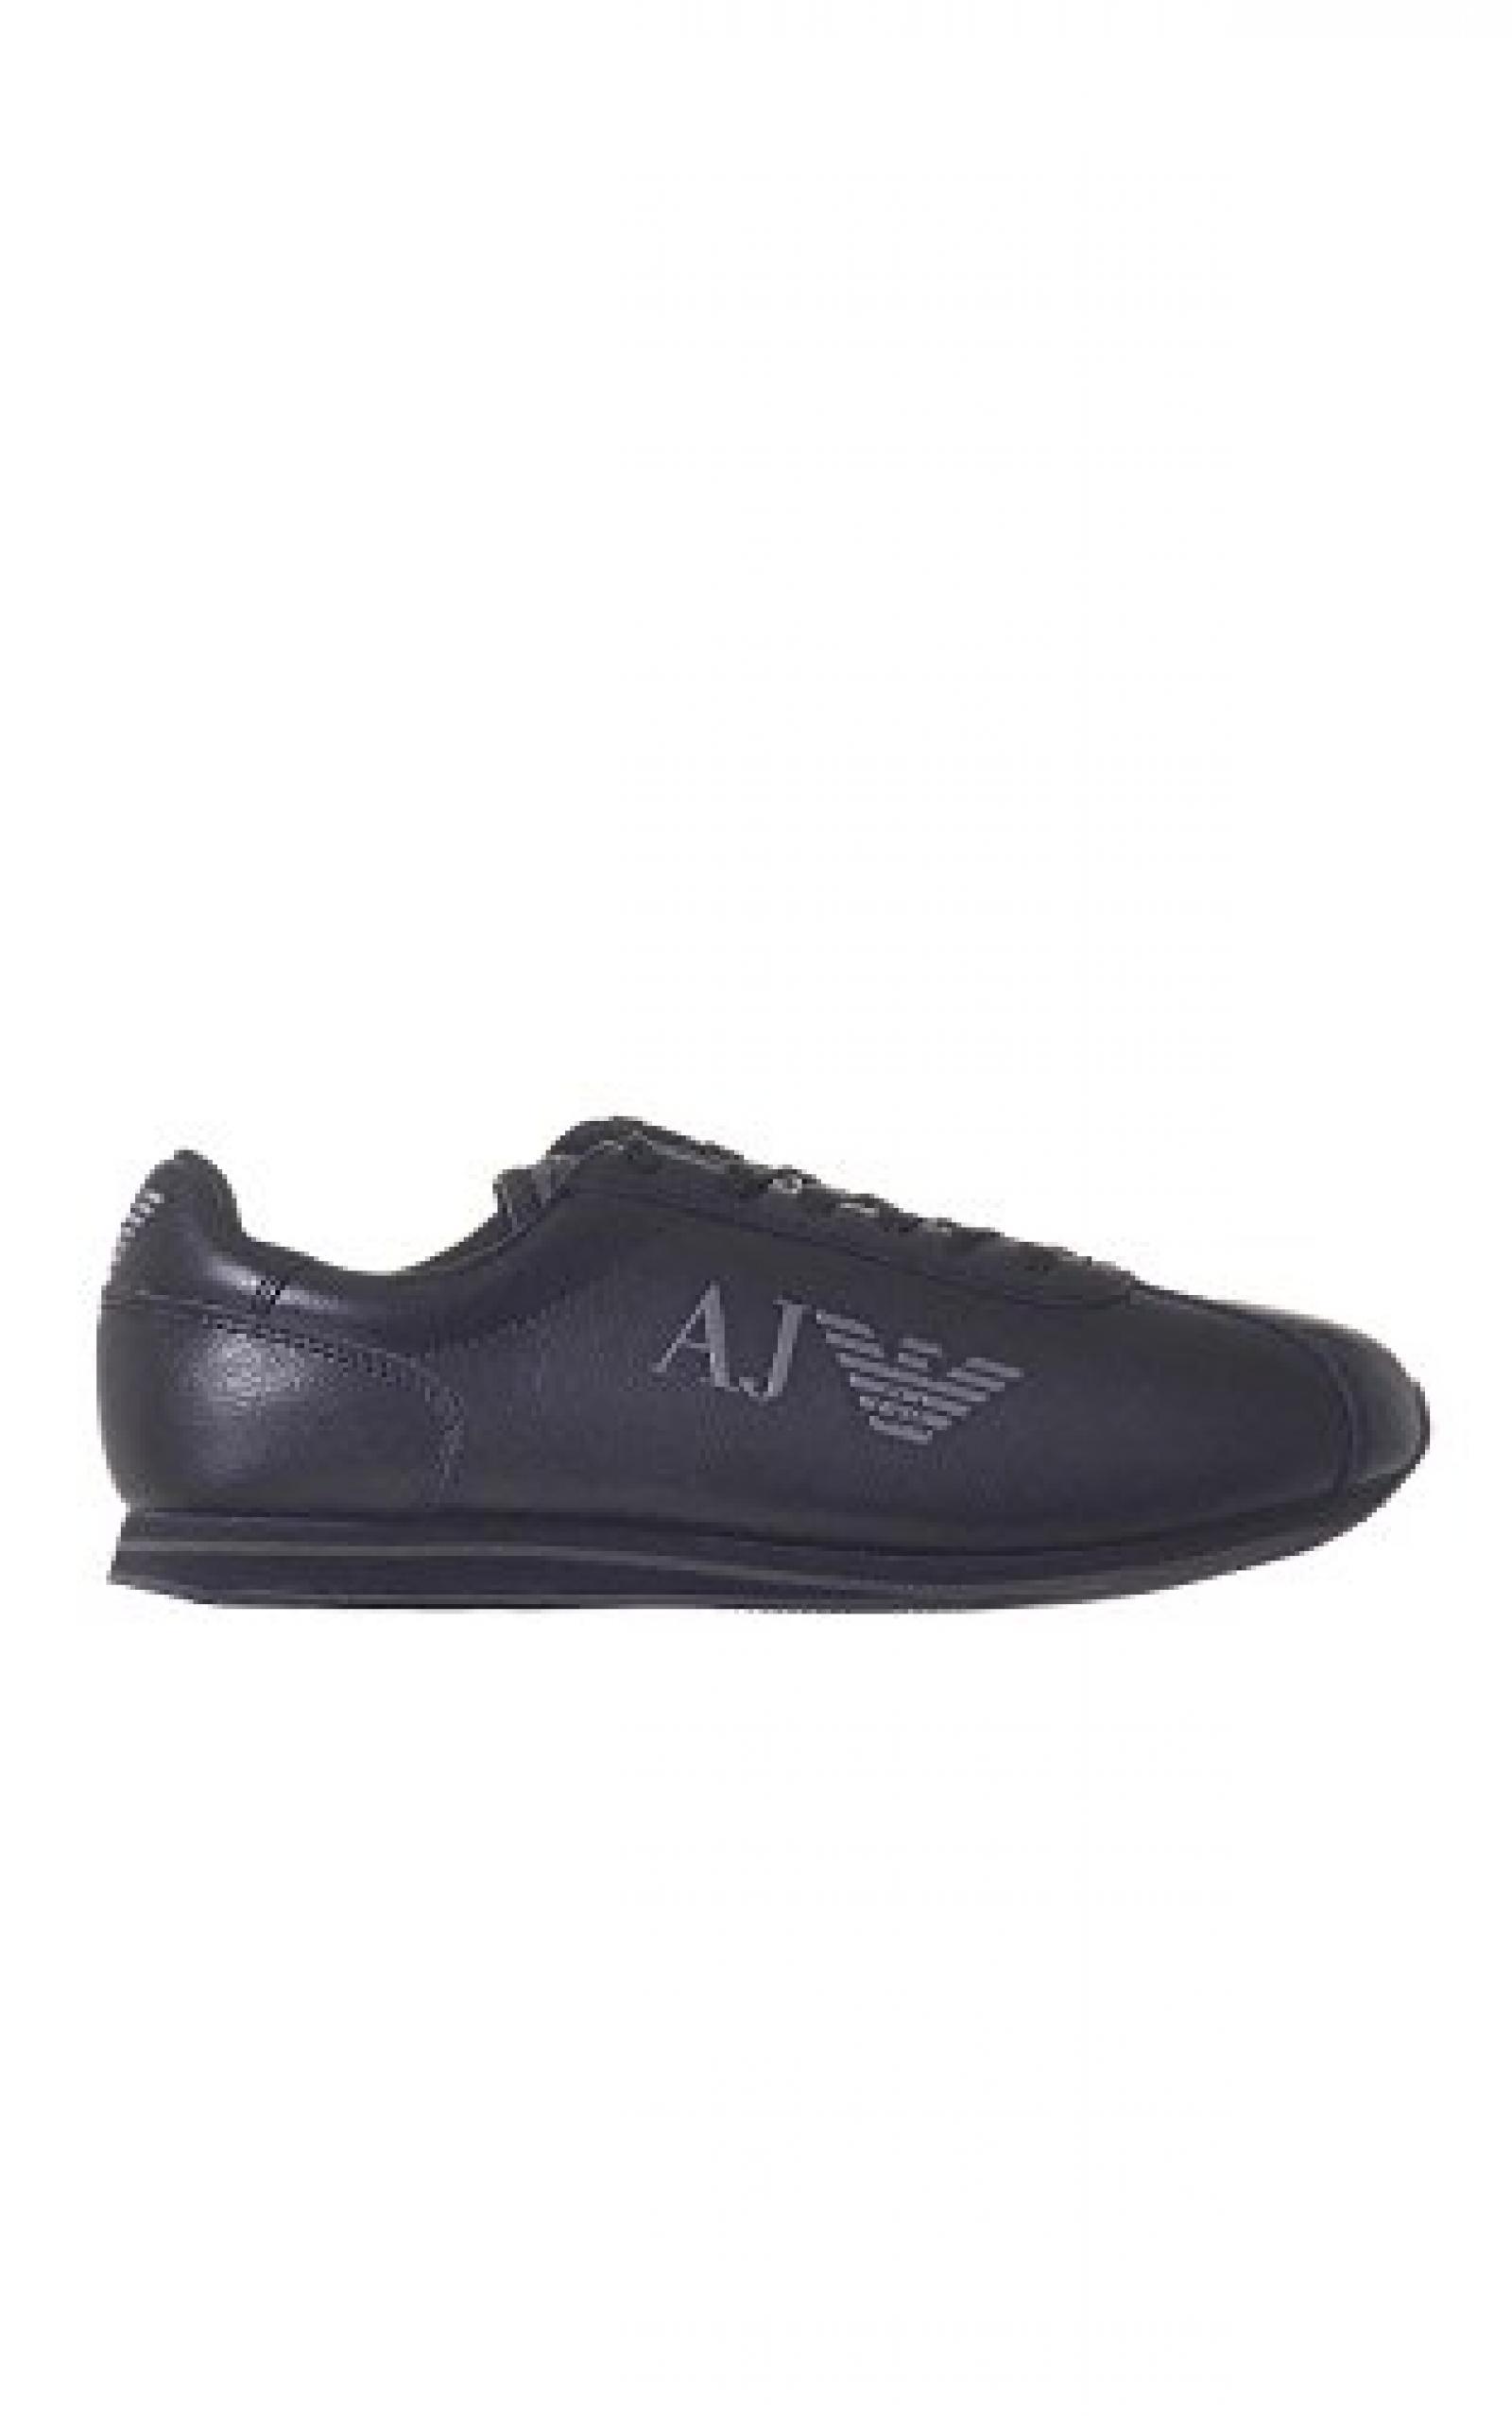 Armani Jeans Leather Runner Herren Sneaker Schwarz